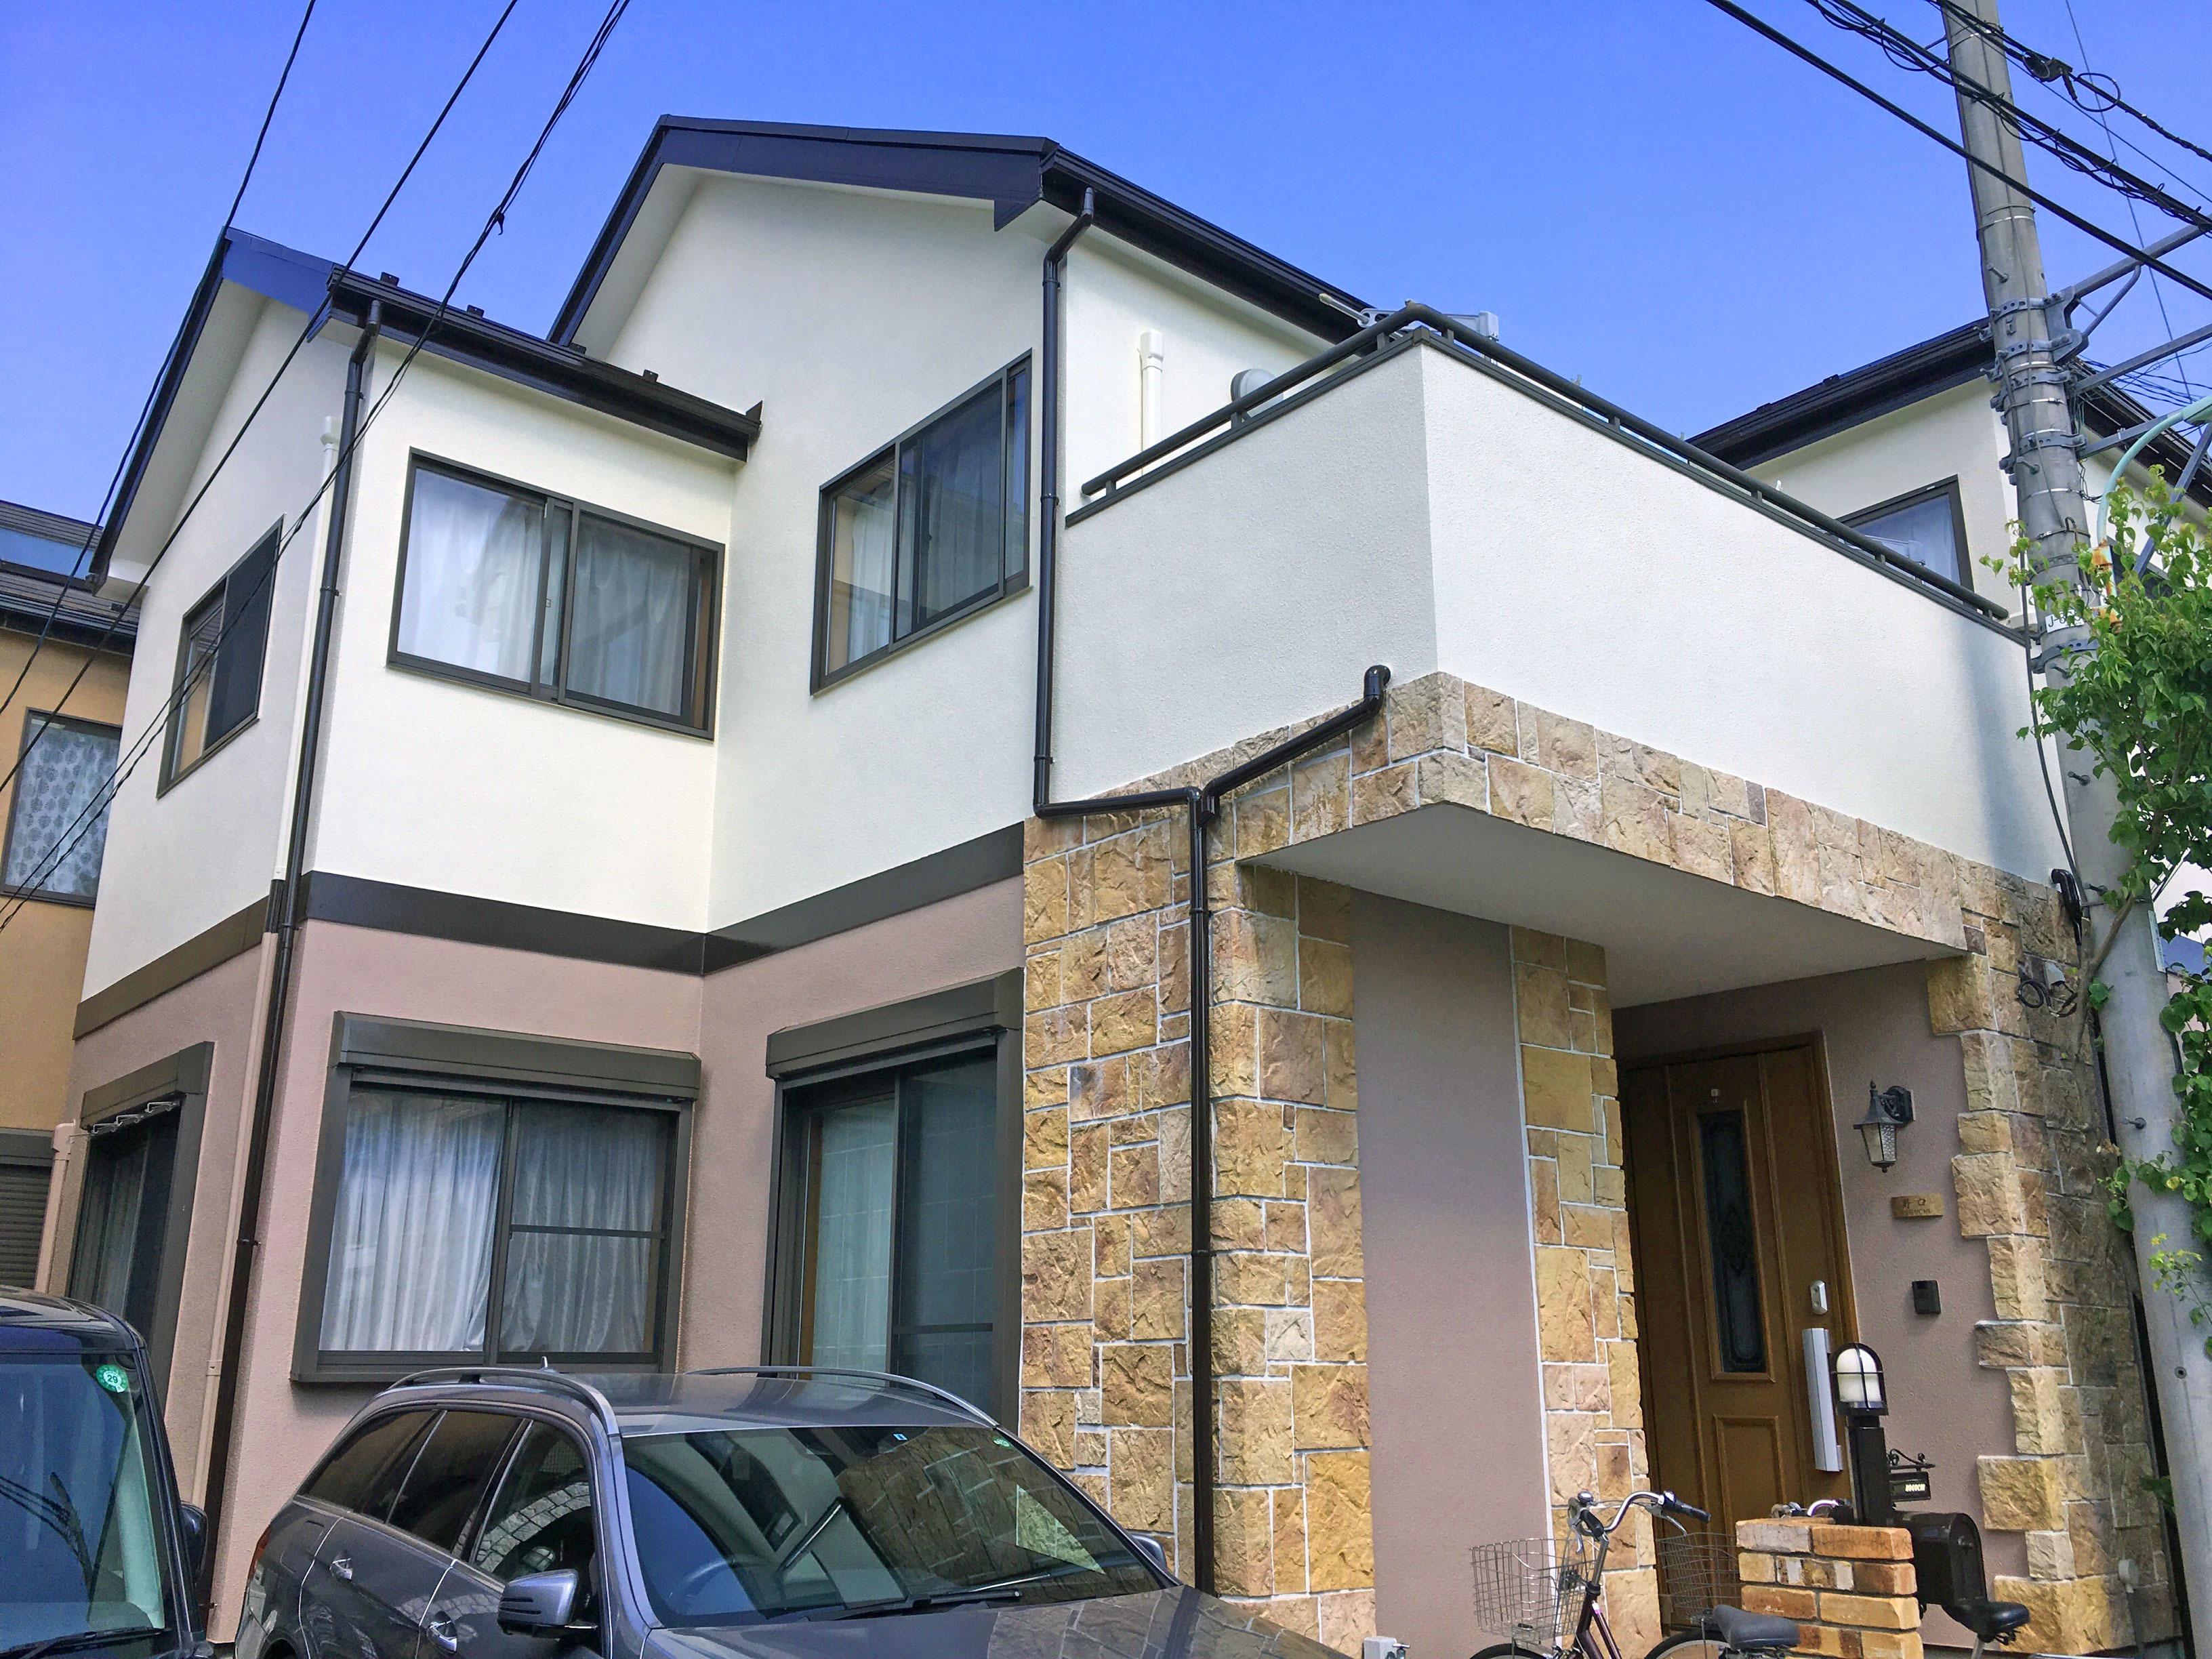 埼玉県 浦和区 屋根・外壁塗装 S様邸 | ケイナスホーム 埼玉 16